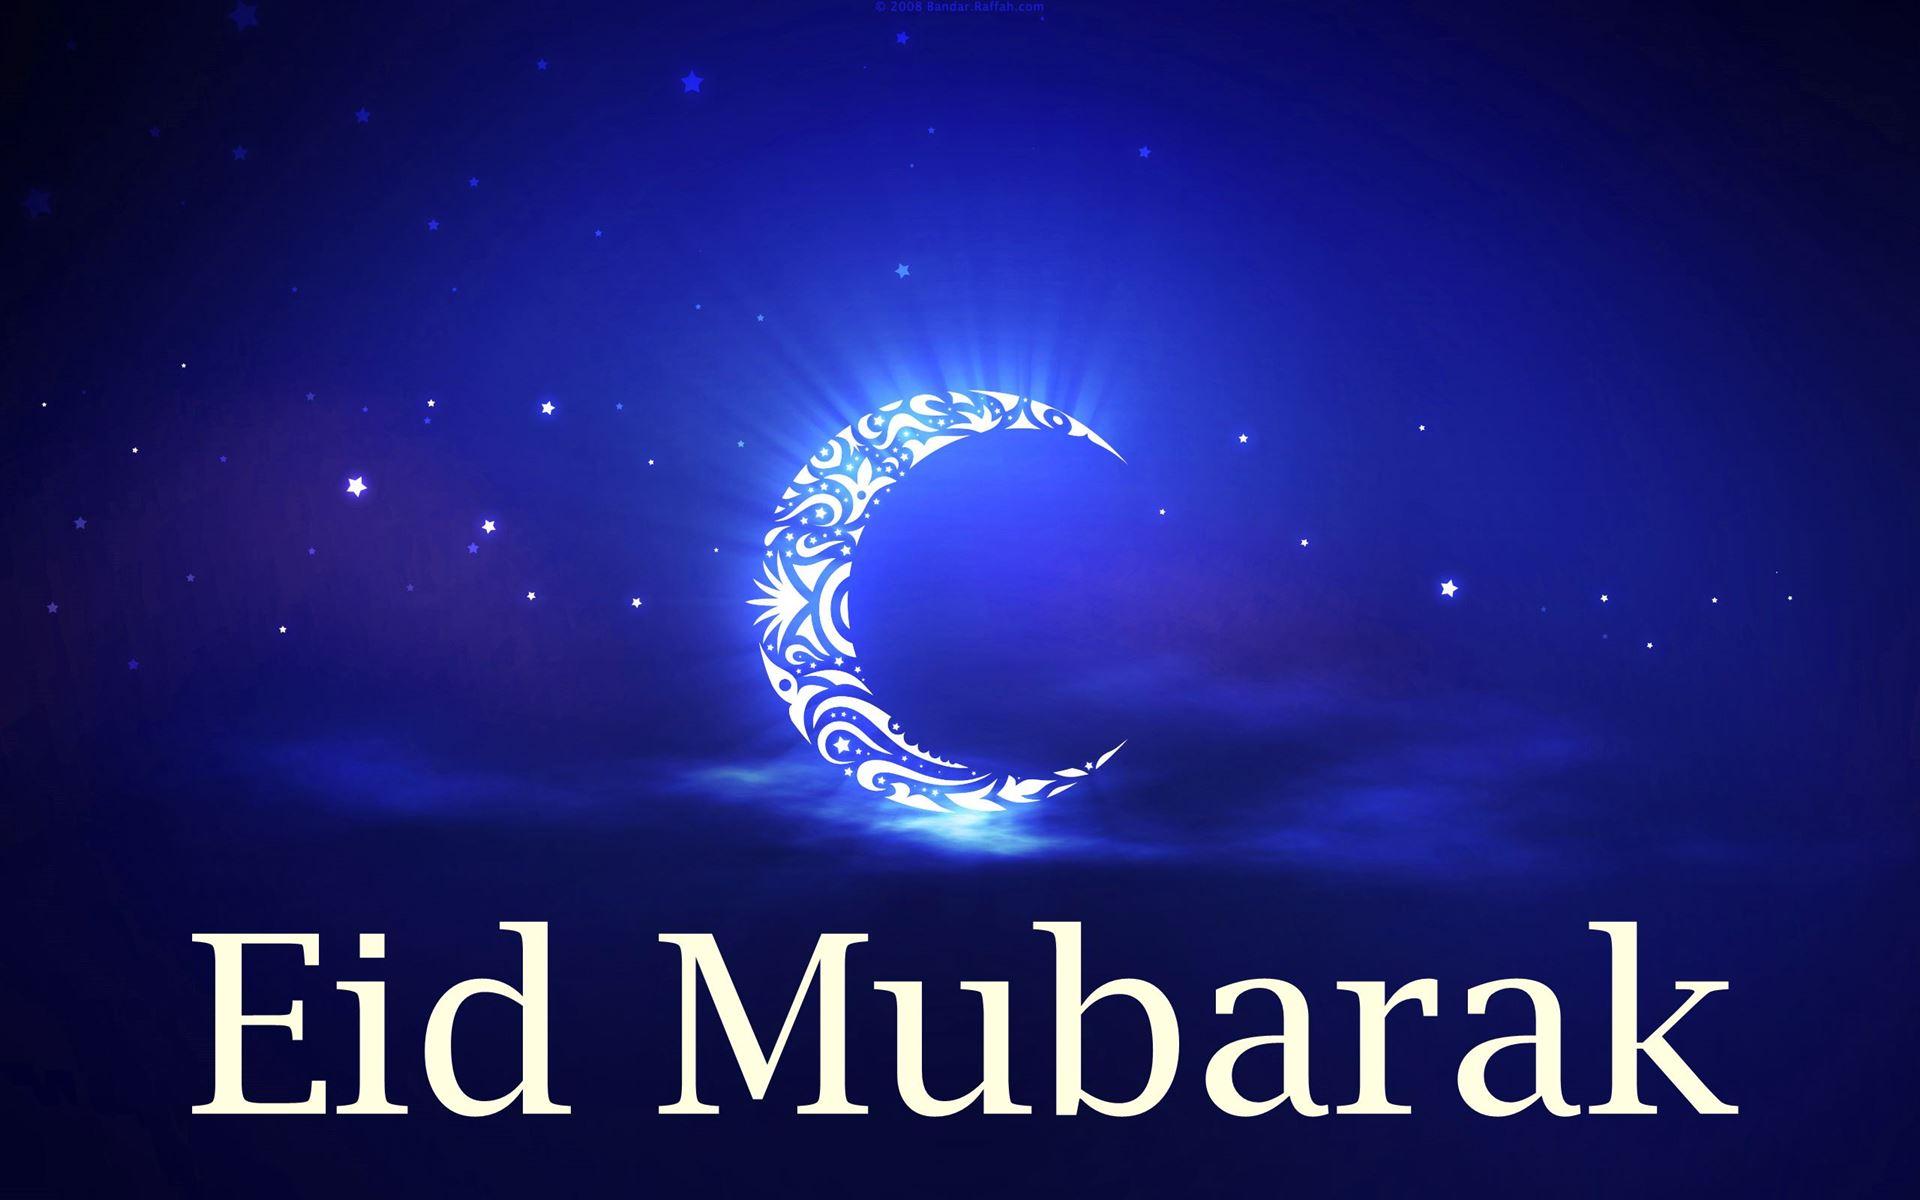 SF Wishes Eid Mubarak To Muslims Worldwide